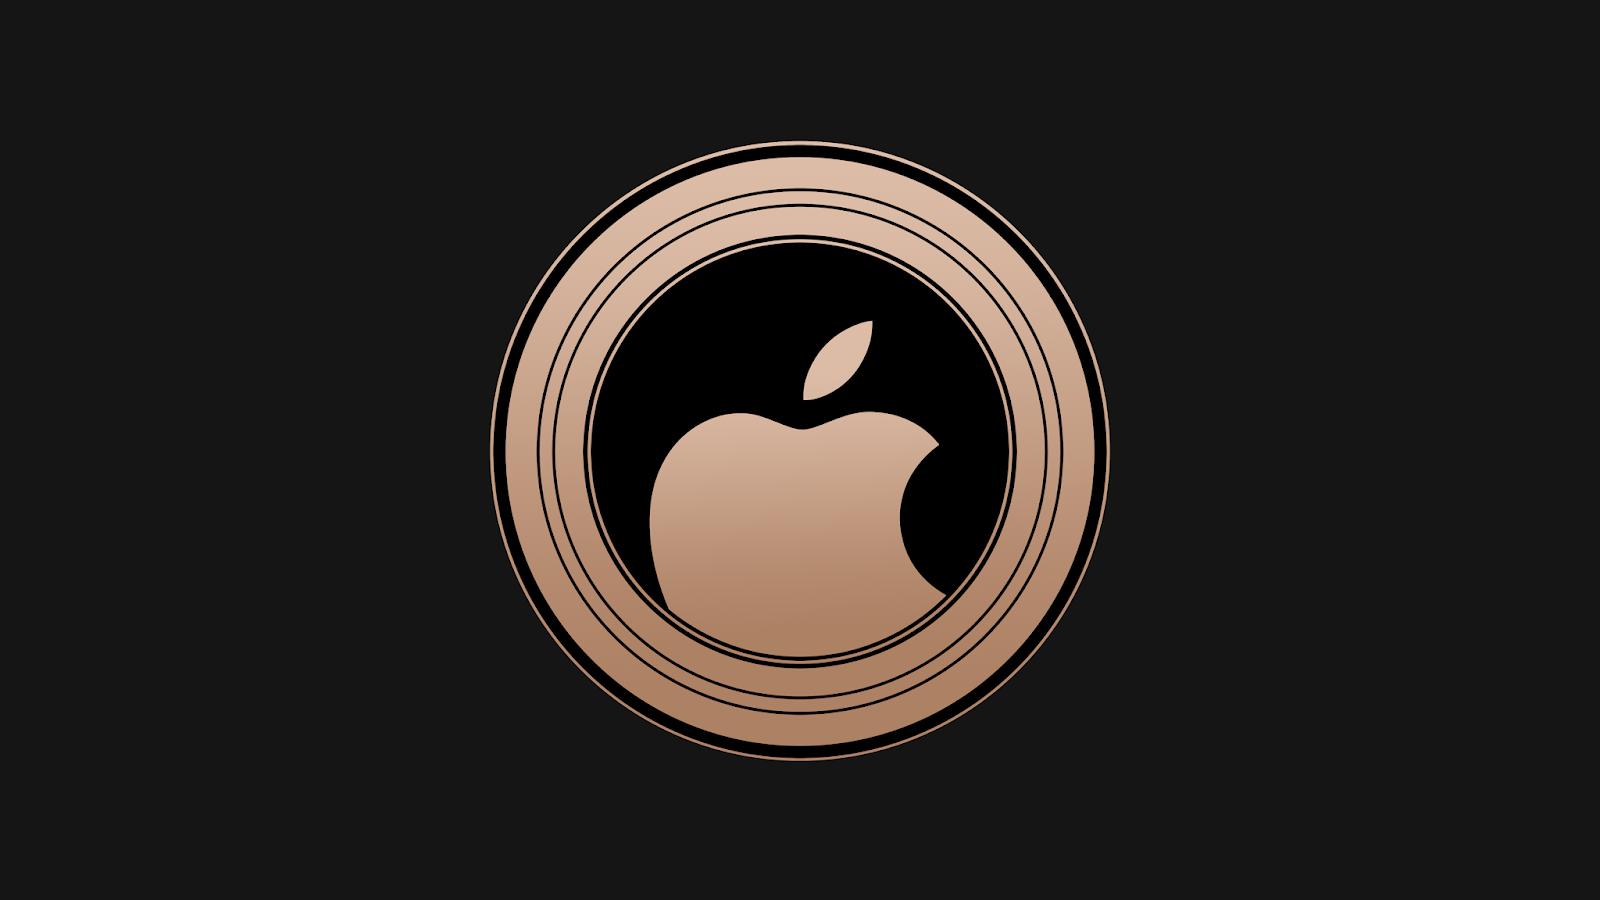 Apple logo, iPhone XS, 5K, Technology